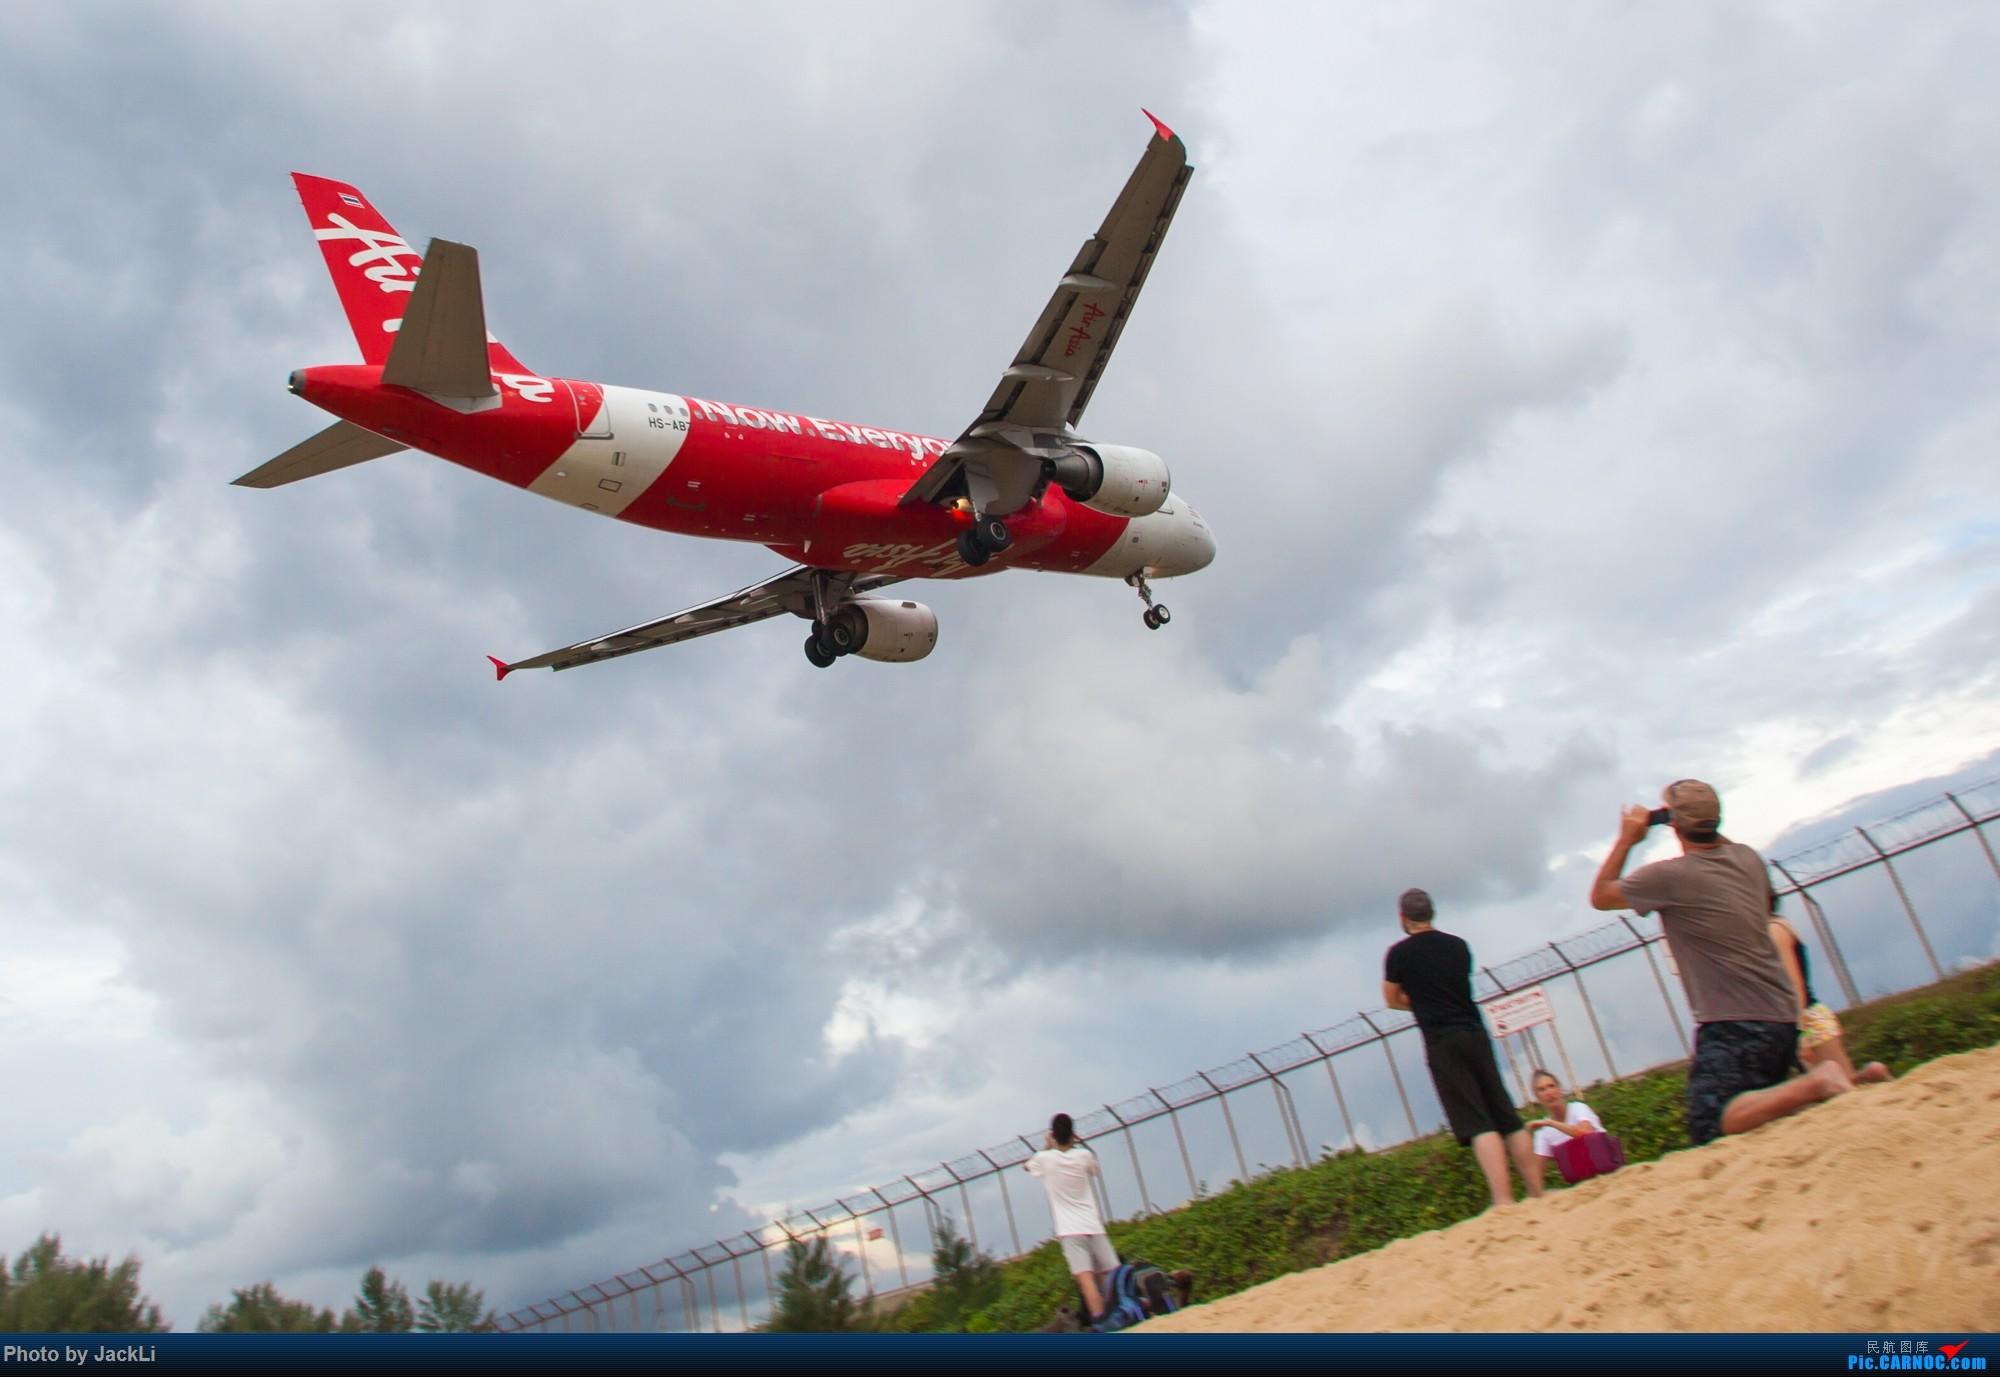 Re:[原创]【JackLi】亚洲圣马丁~普吉岛机场拍机 AIRBUS A320 HS-ABZ 泰国普吉机场